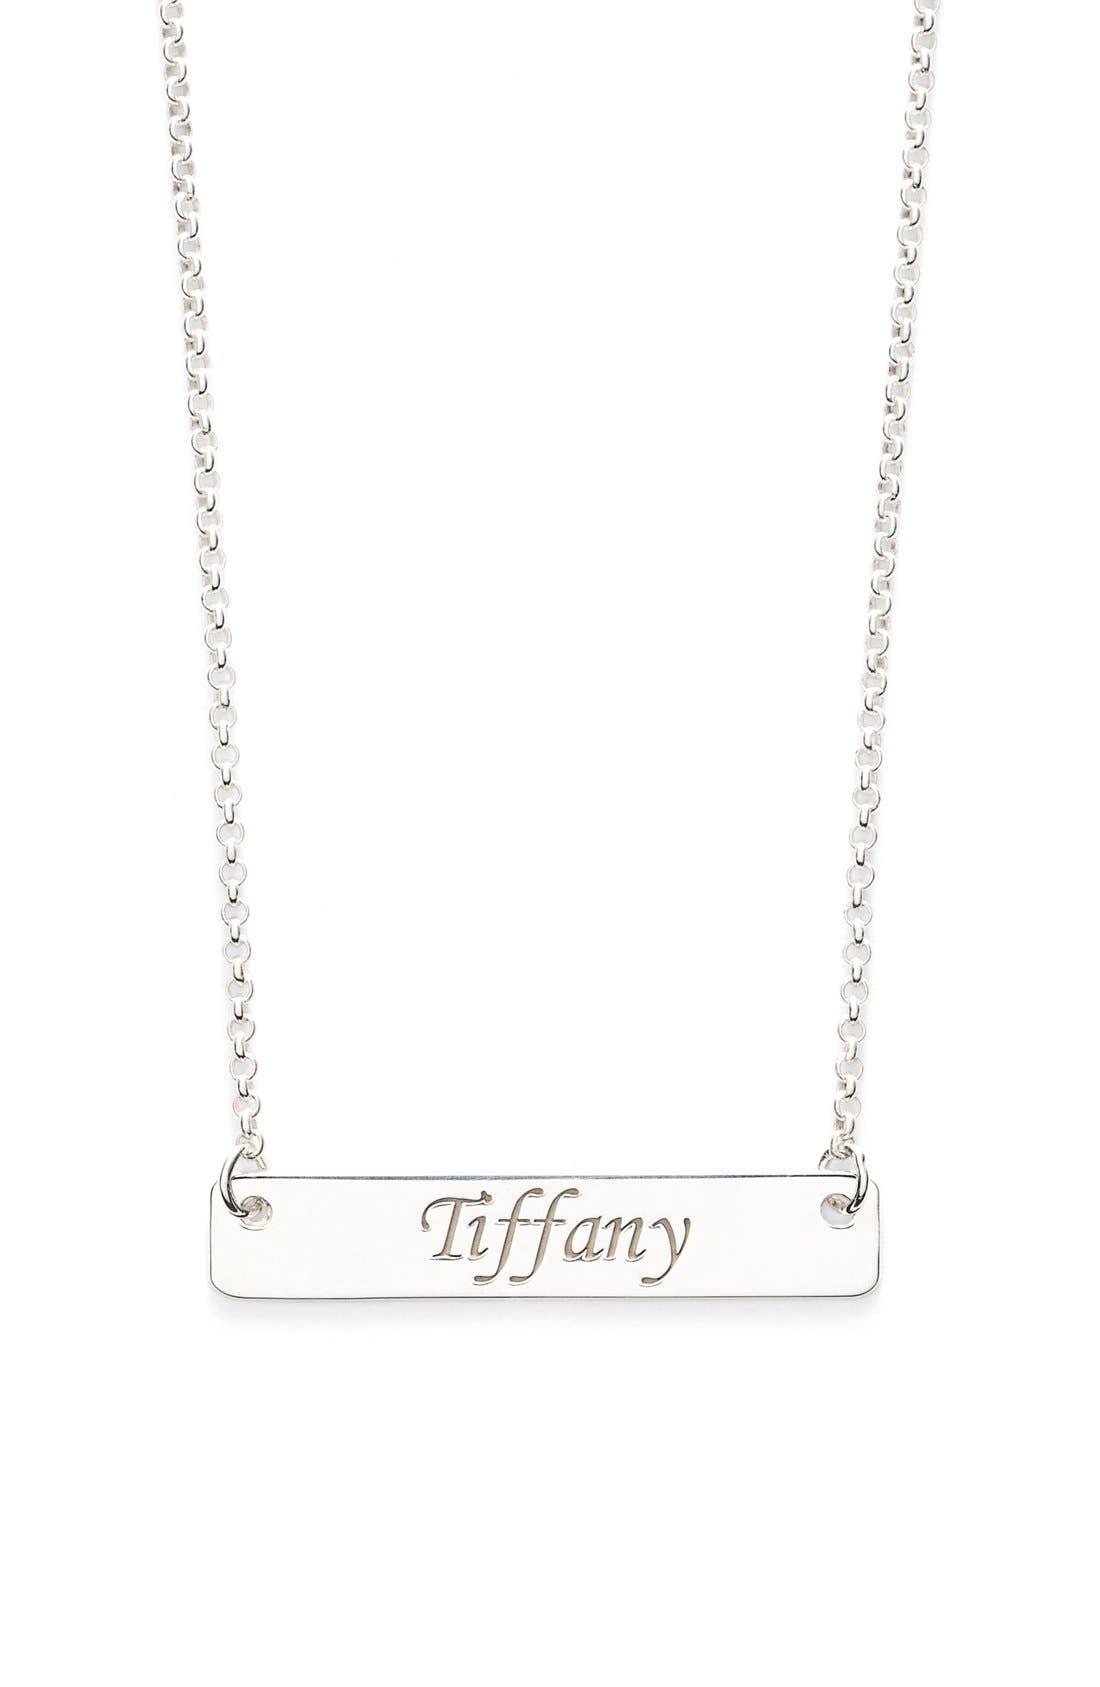 Personalized Script Bar Pendant Necklace,                         Main,                         color, Silver